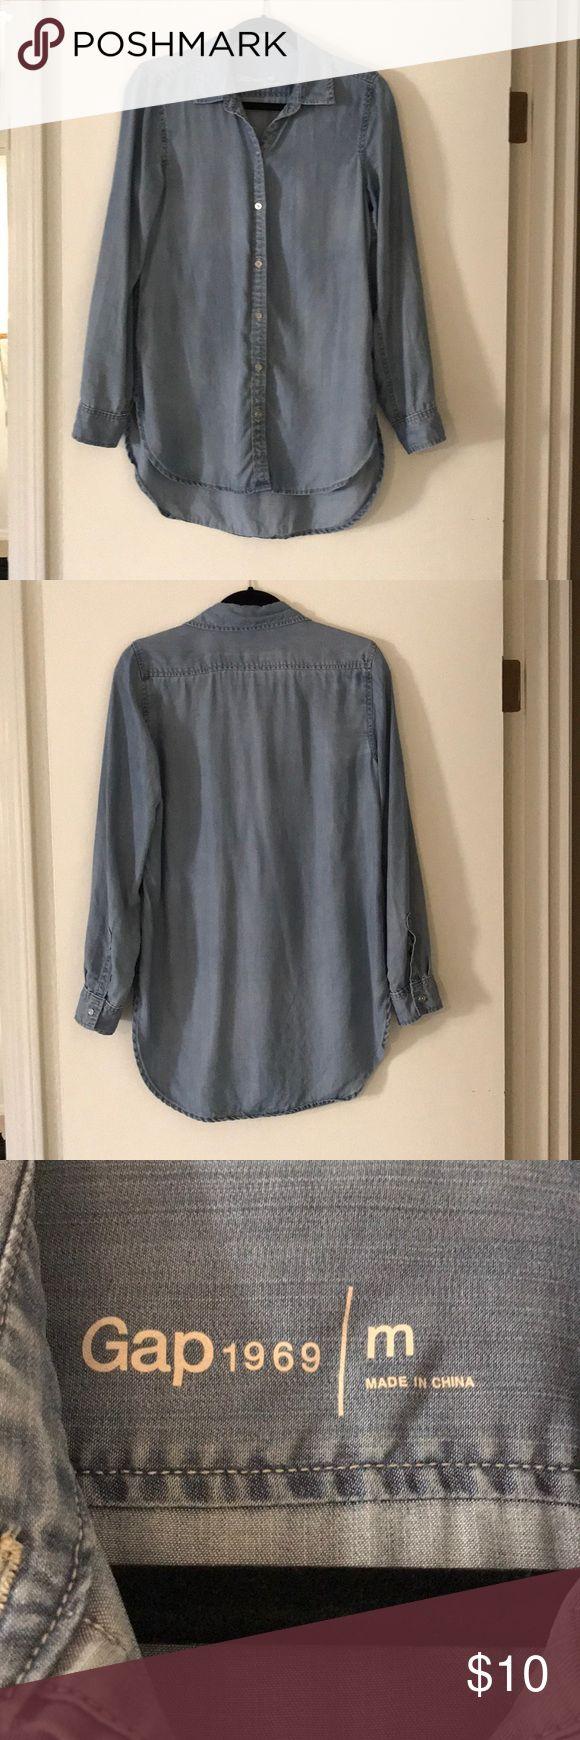 Long sleeve Gap top Super soft long sleeve denim top GAP Tops Tunics